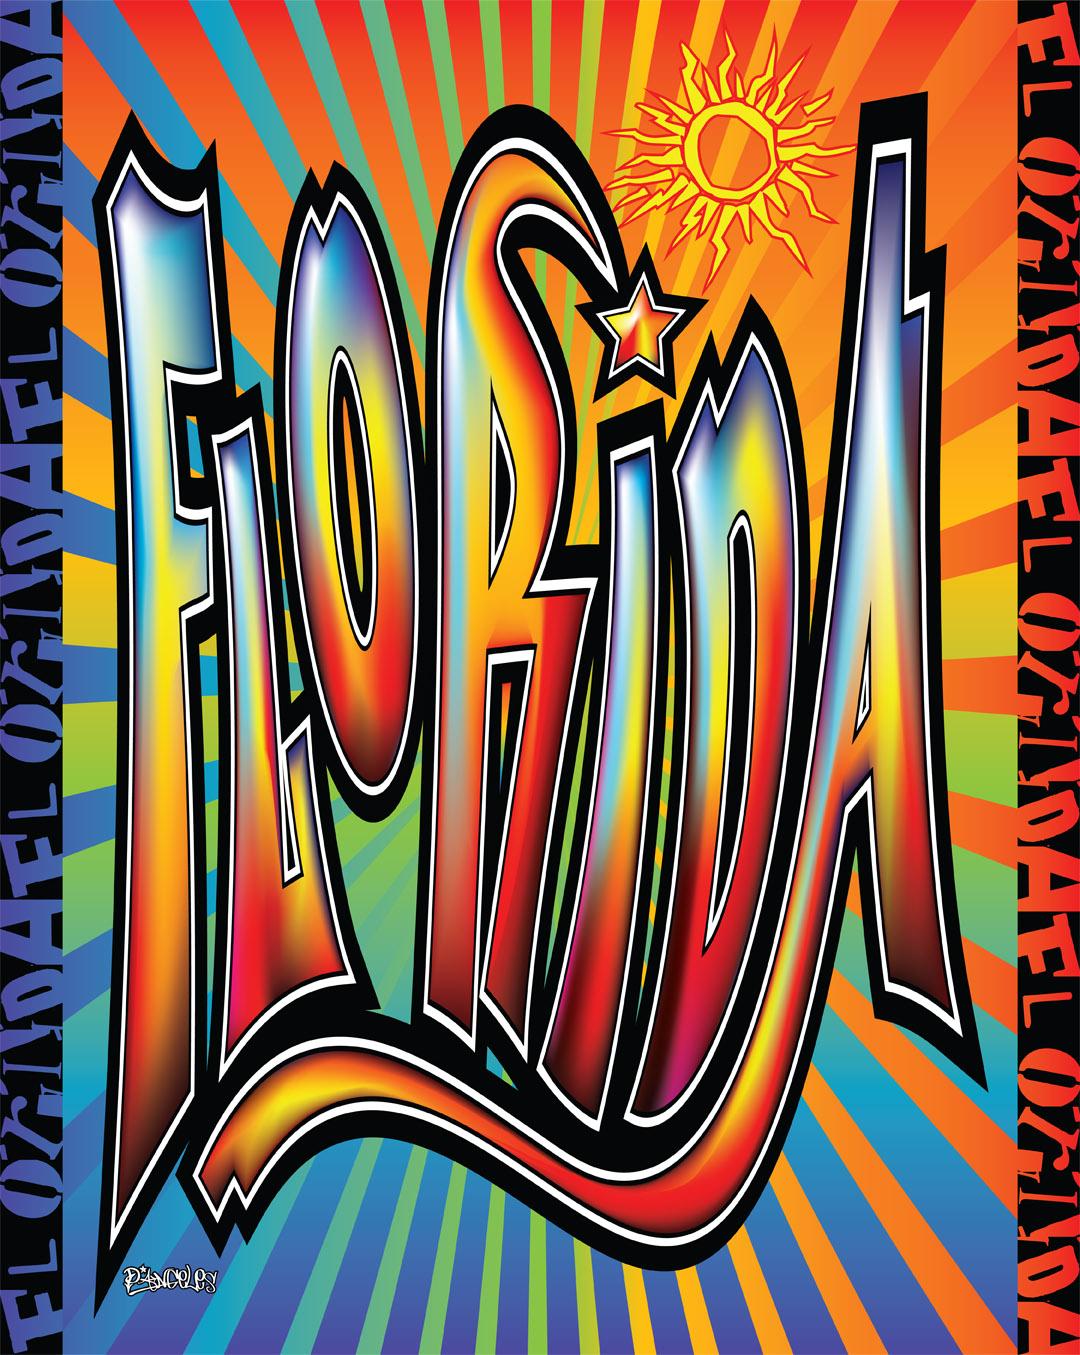 Florida Graffiti Beach Blanket - 54x68